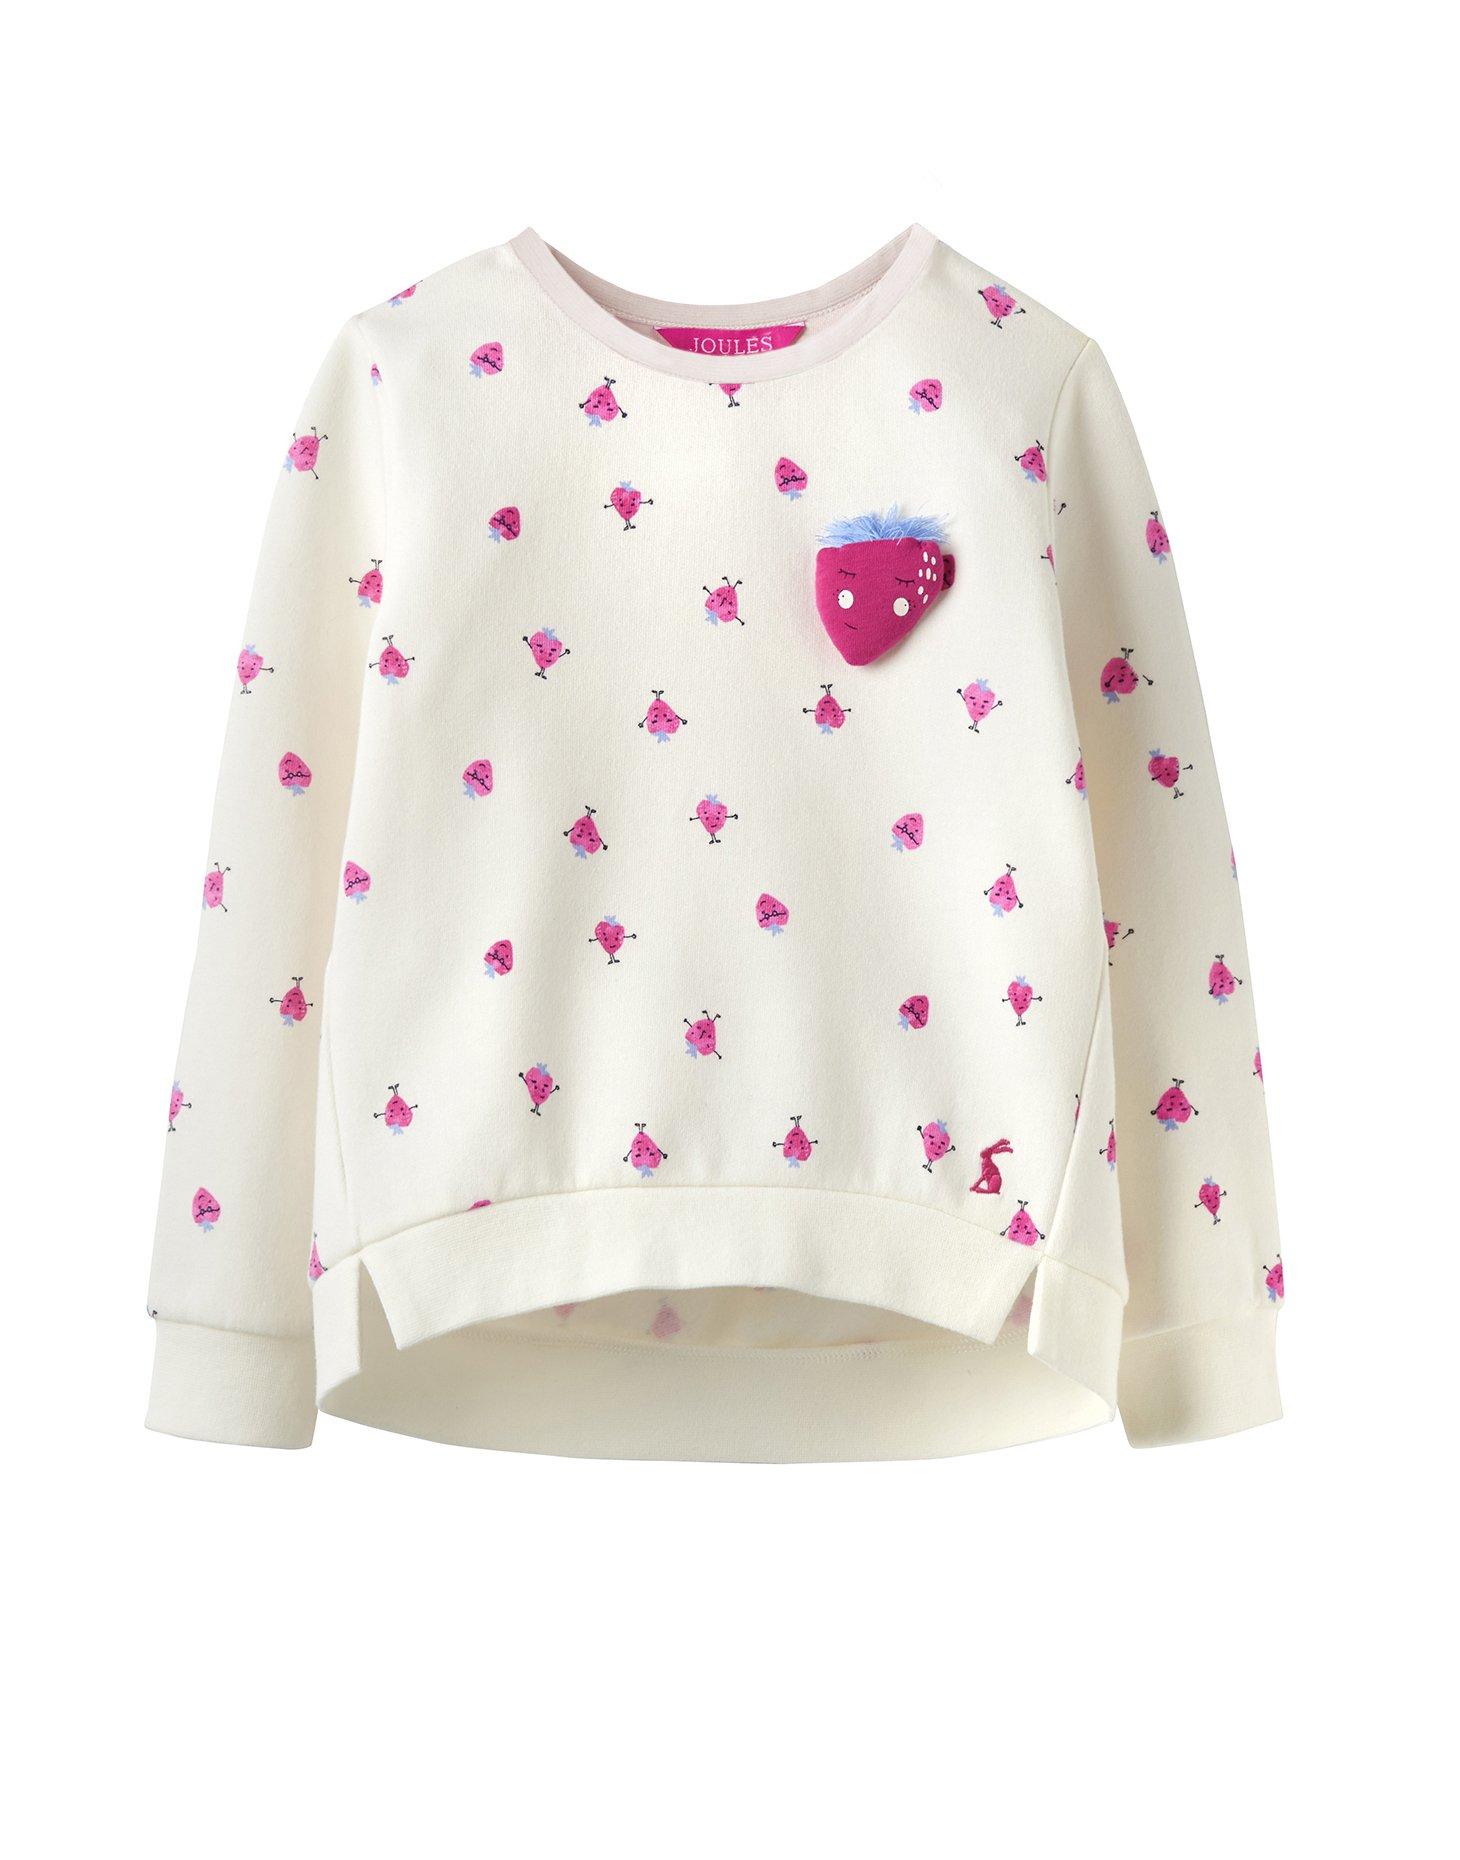 Joules Screen Print Sweatshirt - Cream Strawberry Spot - 5 Years - 110 cm by Joules